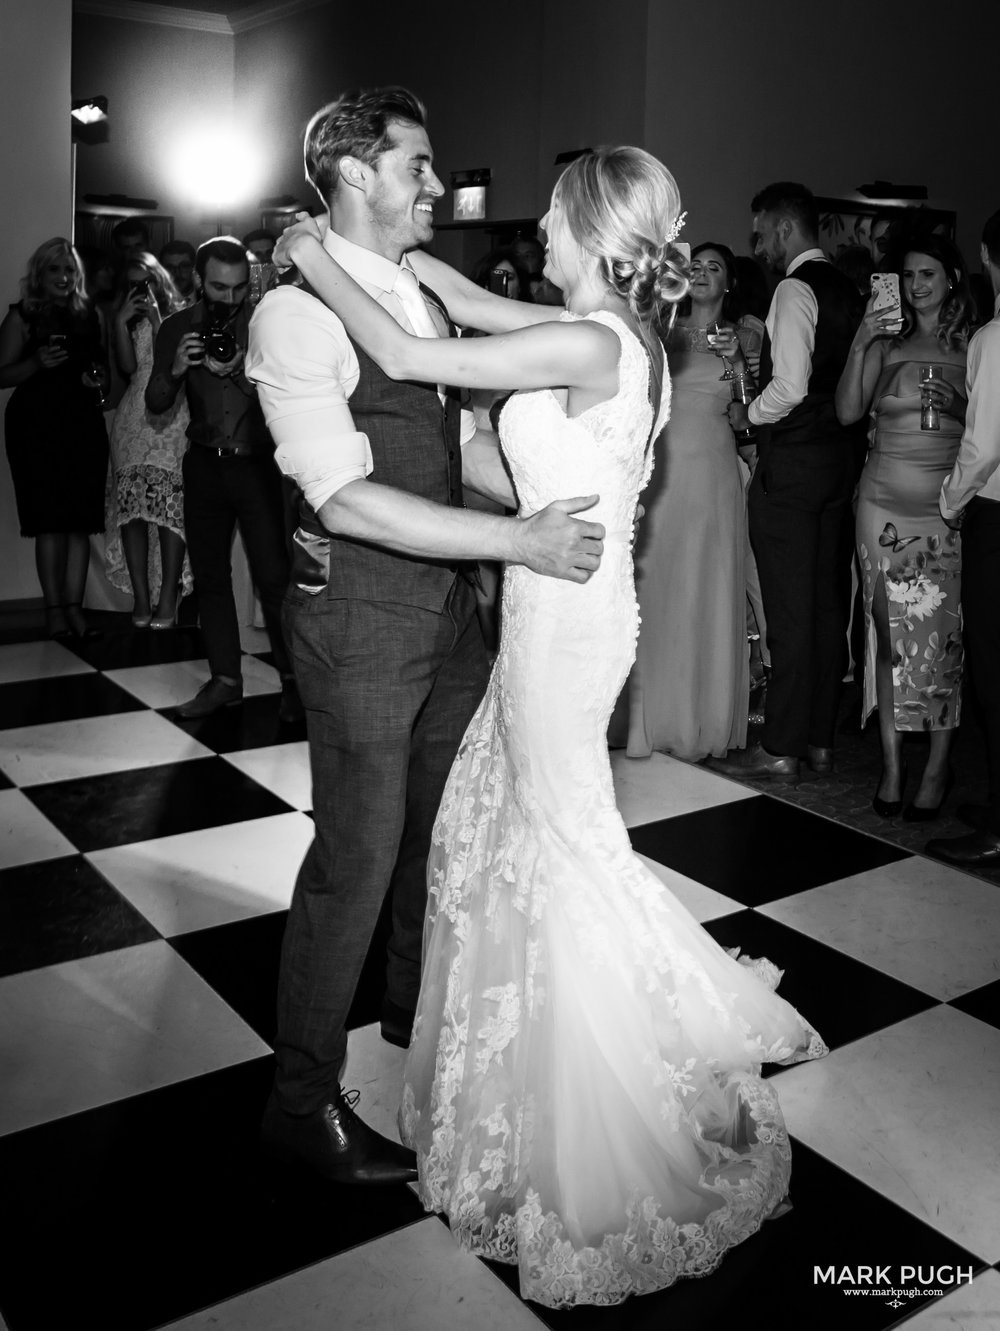 121 - Lucy and  Steven fineART wedding photography by www.markpugh.com Mark Pugh of www.mpmedia.co.uk_.JPG